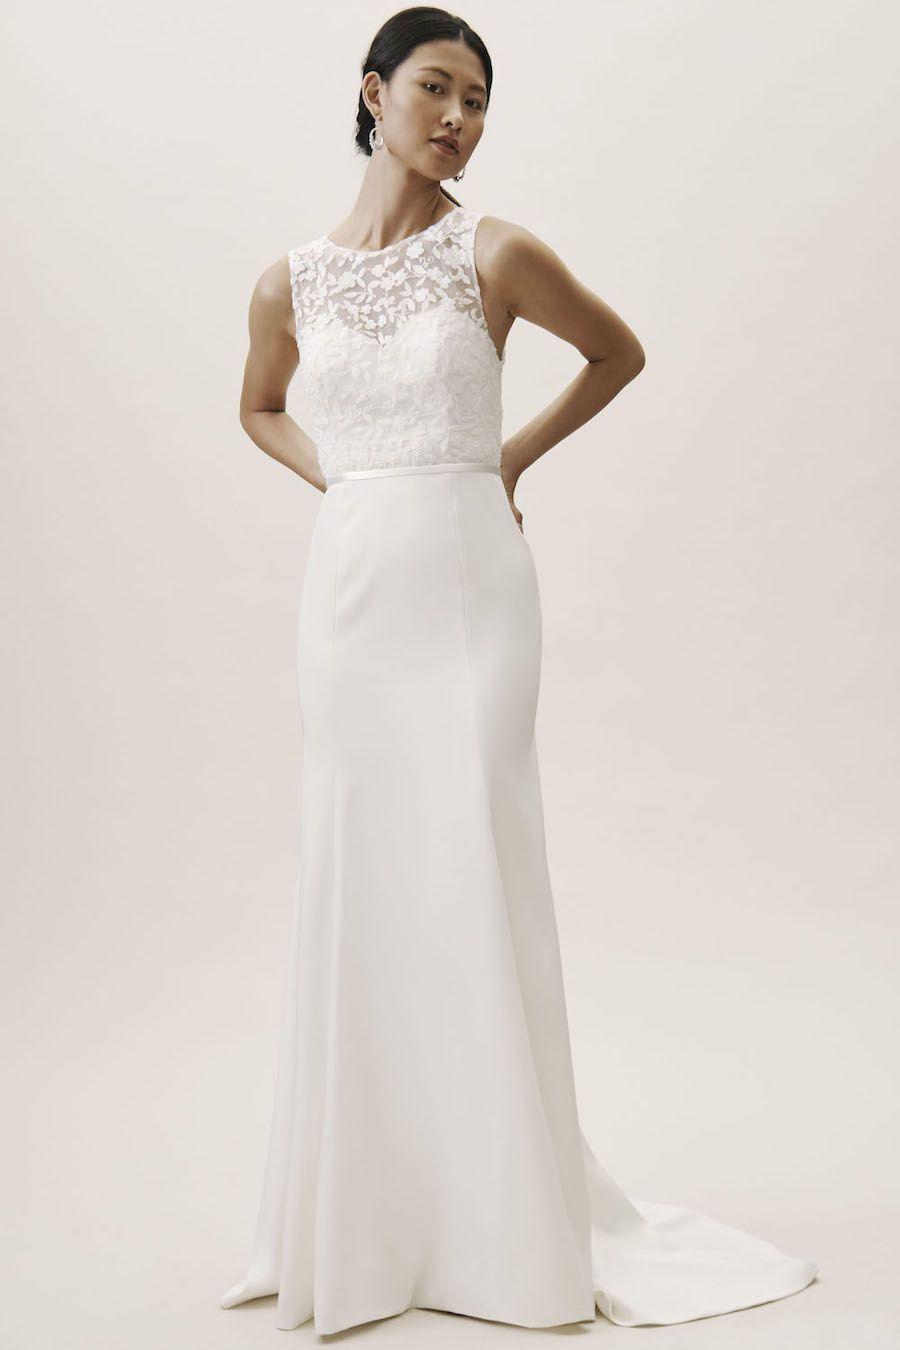 e12e09084be Stylish Spring 2019 BHLDN Wedding Dresses and Bridesmaid Dresses ...